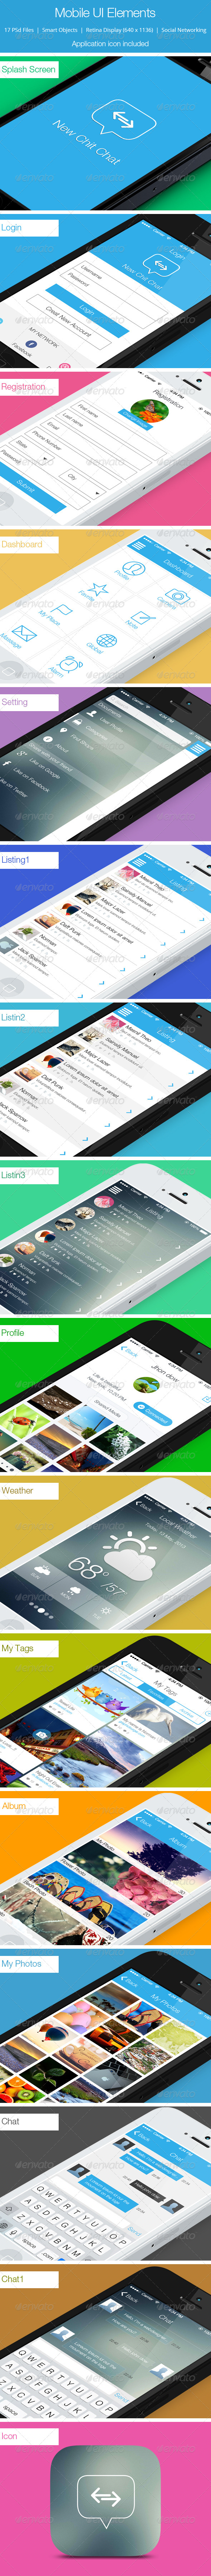 GraphicRiver Mobile UI Elements 5447352